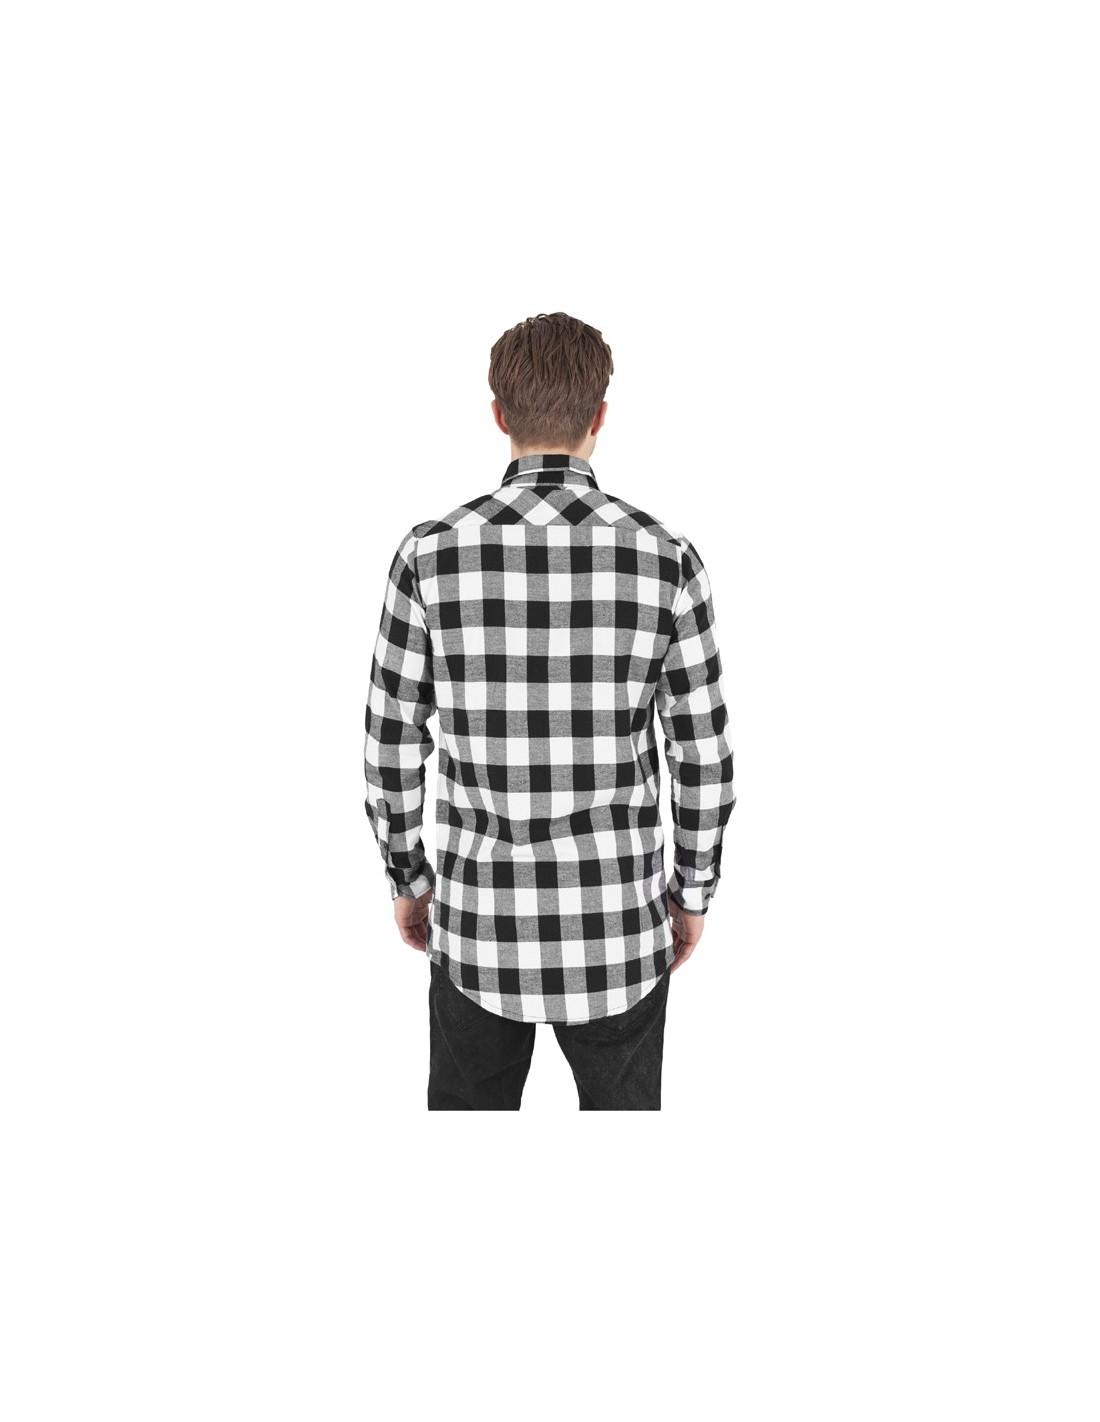 84e1225372 ... Urban Classics camisa larga de cuadros - blanco negro